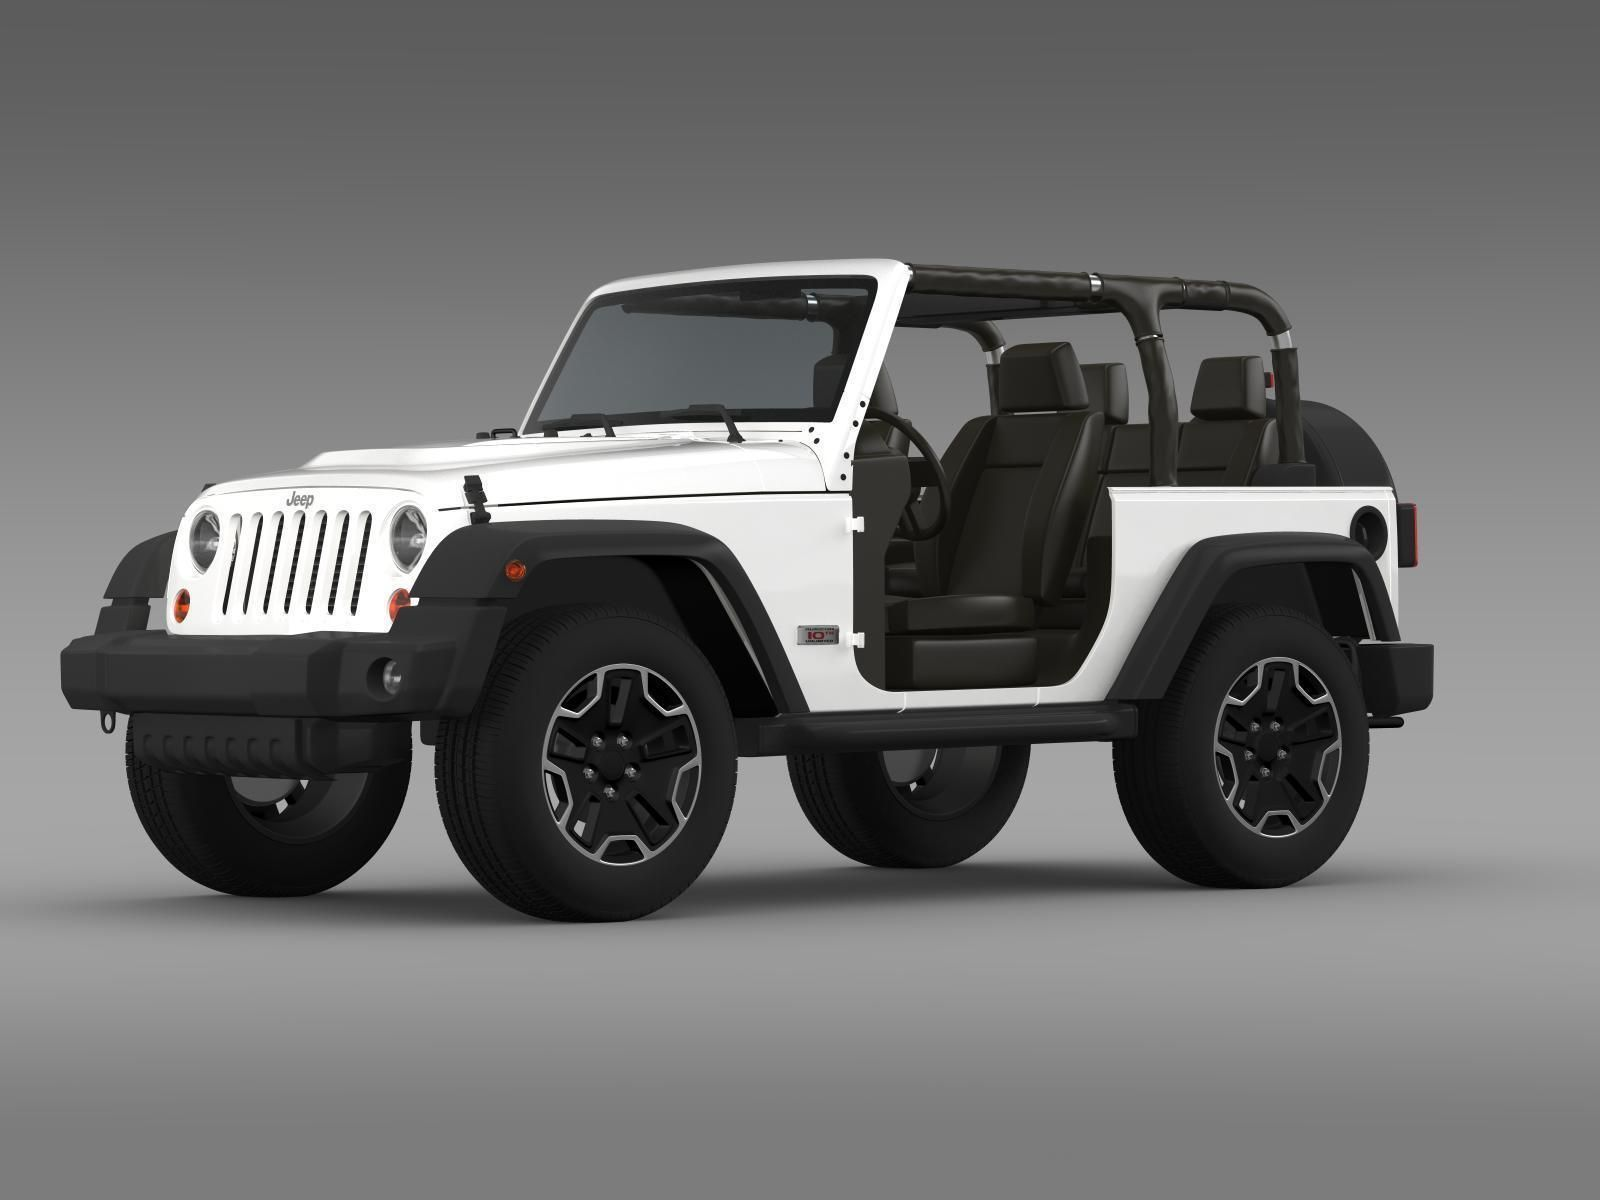 ... Jeep Wrangler Rubicon 10th Anniversary 2014 3d Model Max Obj Mtl 3ds  Fbx C4d Lwo Lw ...